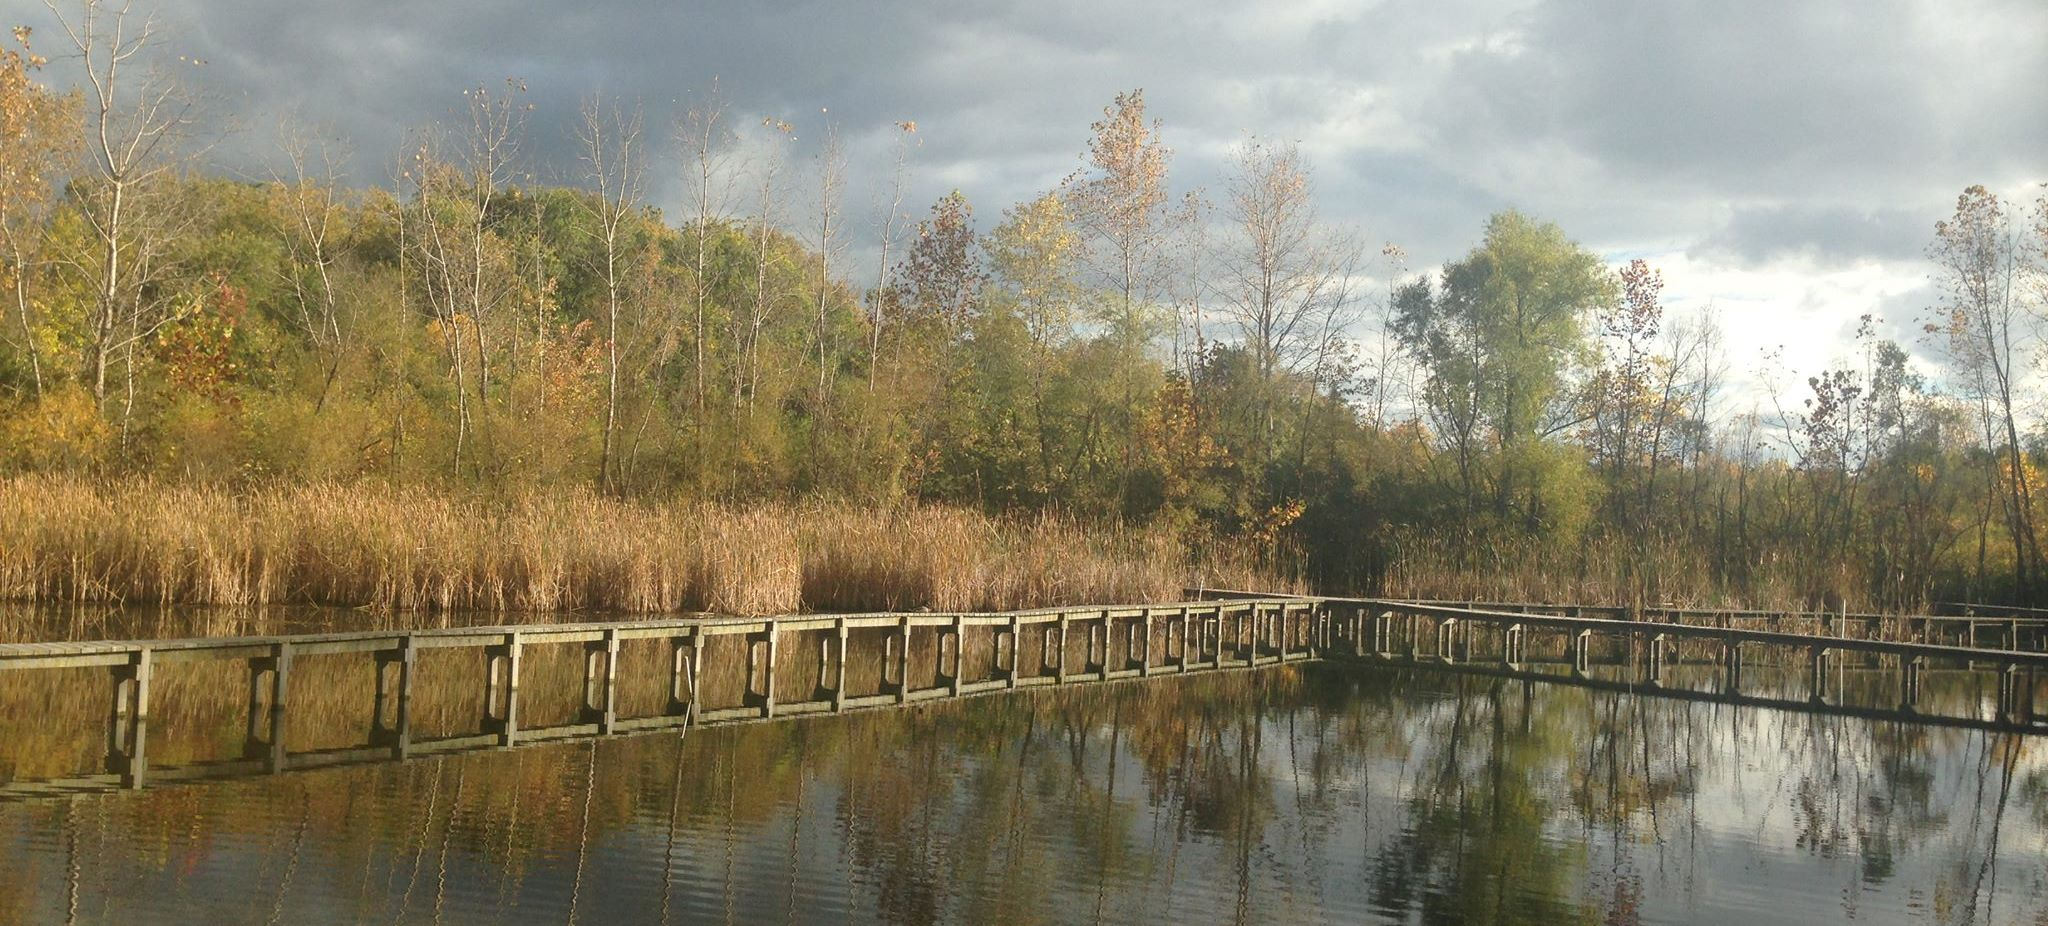 Experimental Wetland 1